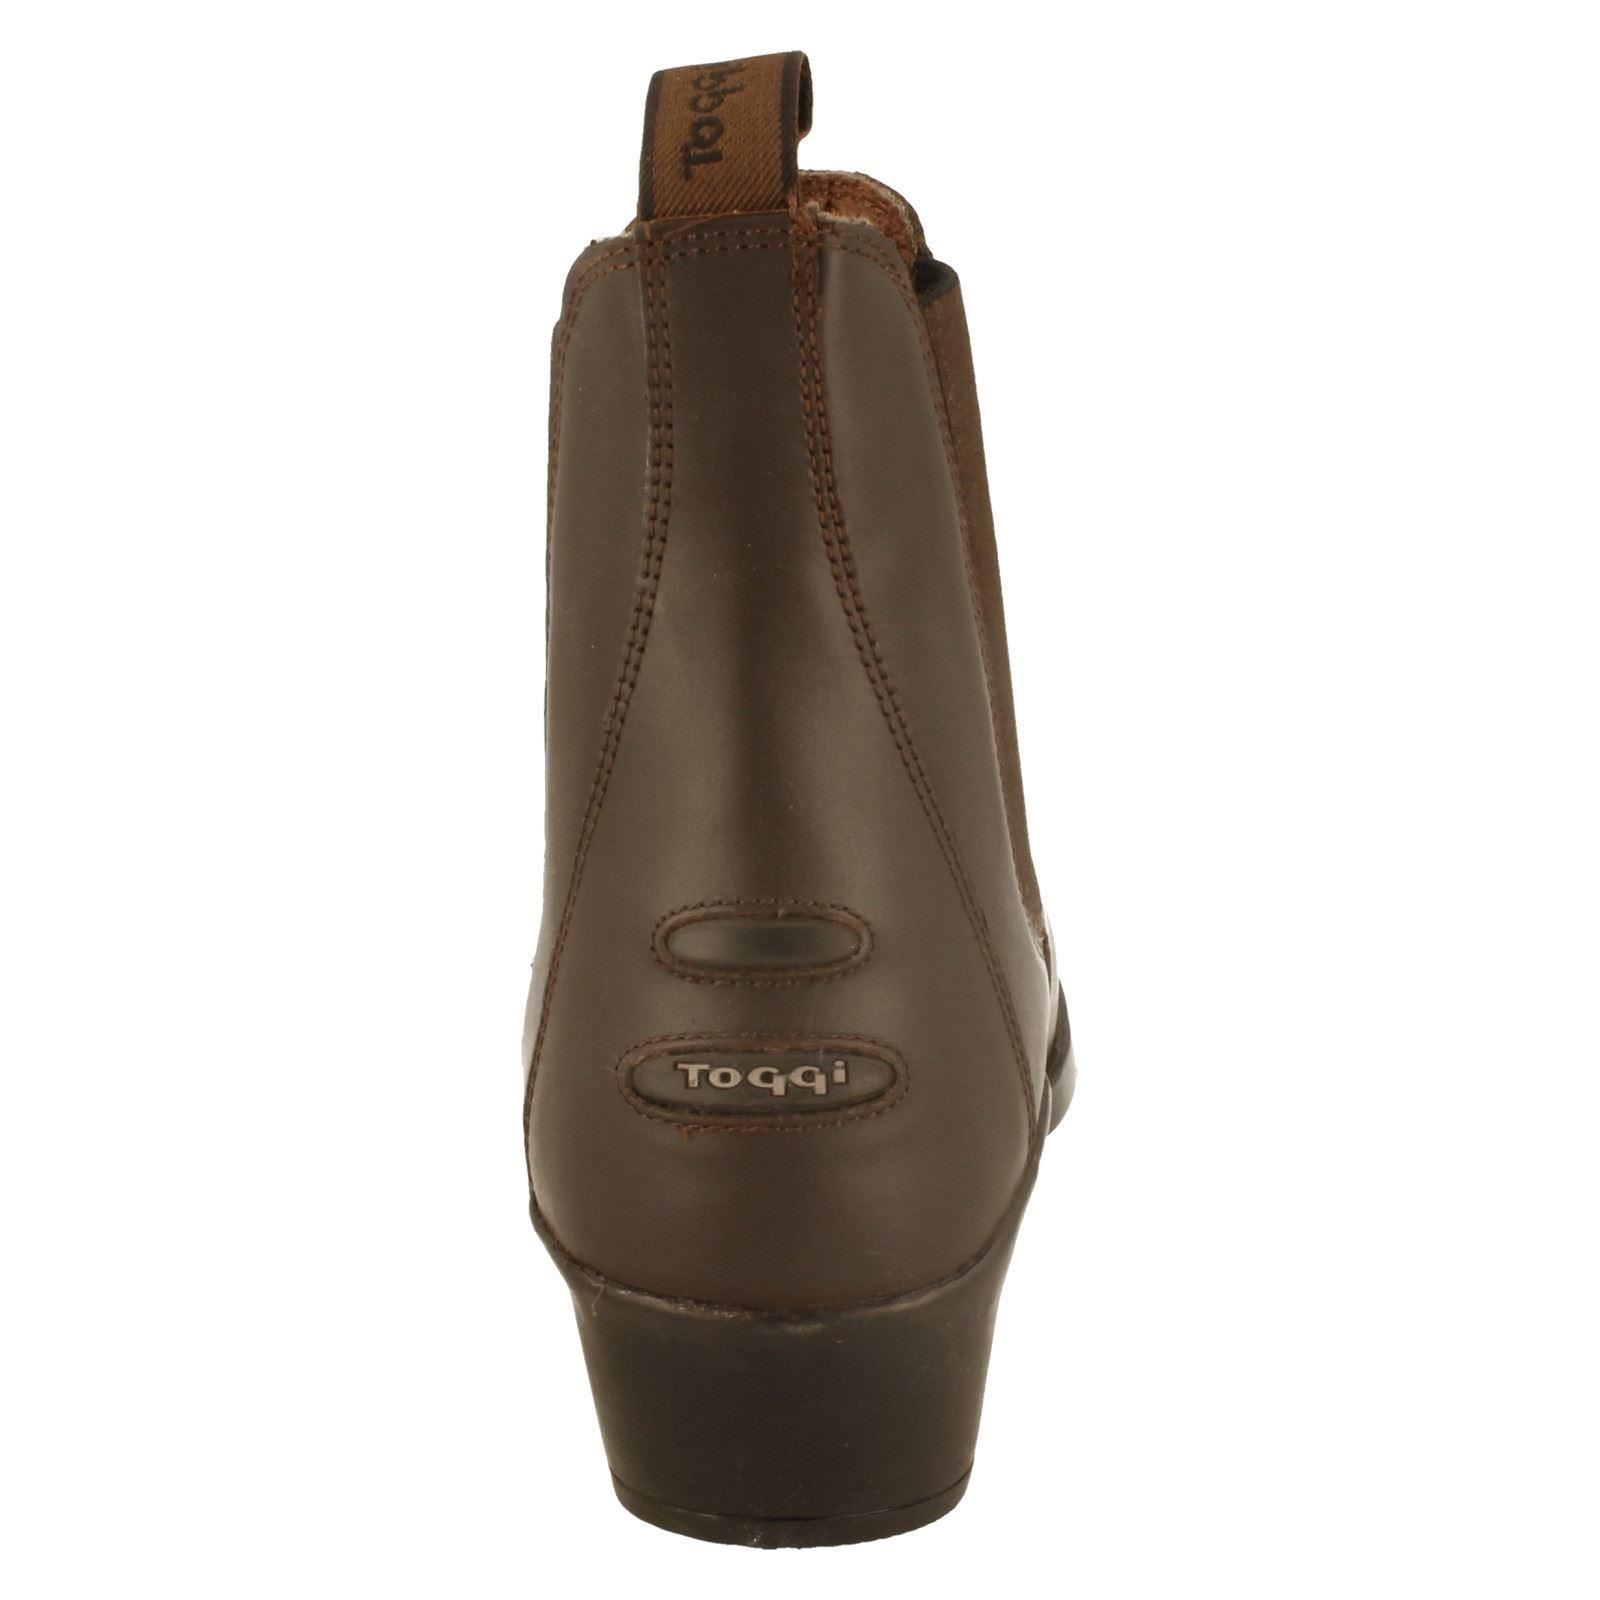 Unisex Style Toggi Jodhpur Riding Stiefel Style Unisex Clearmont-W ade395